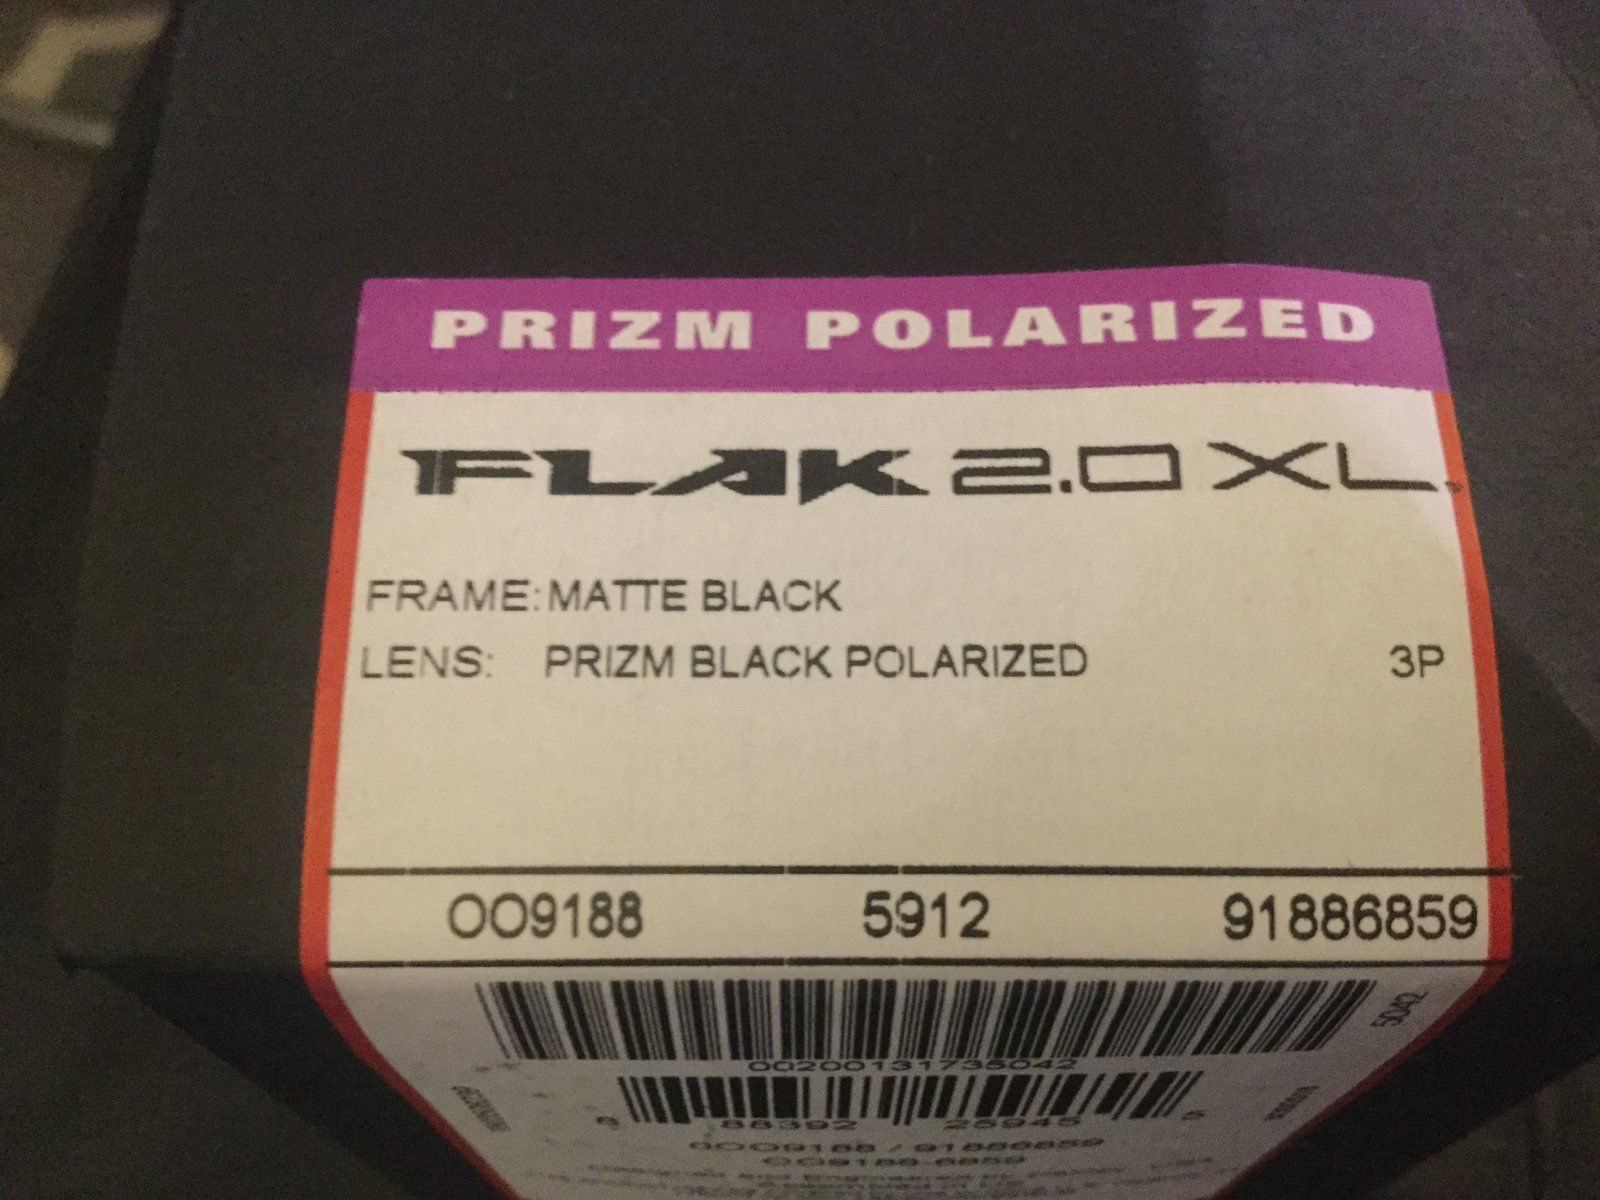 6b99e91e84 OakleySI Flak 2.0XL Blackside Collection -  9E0E3910-7075-4E7A-B002-B9CABEC6917B